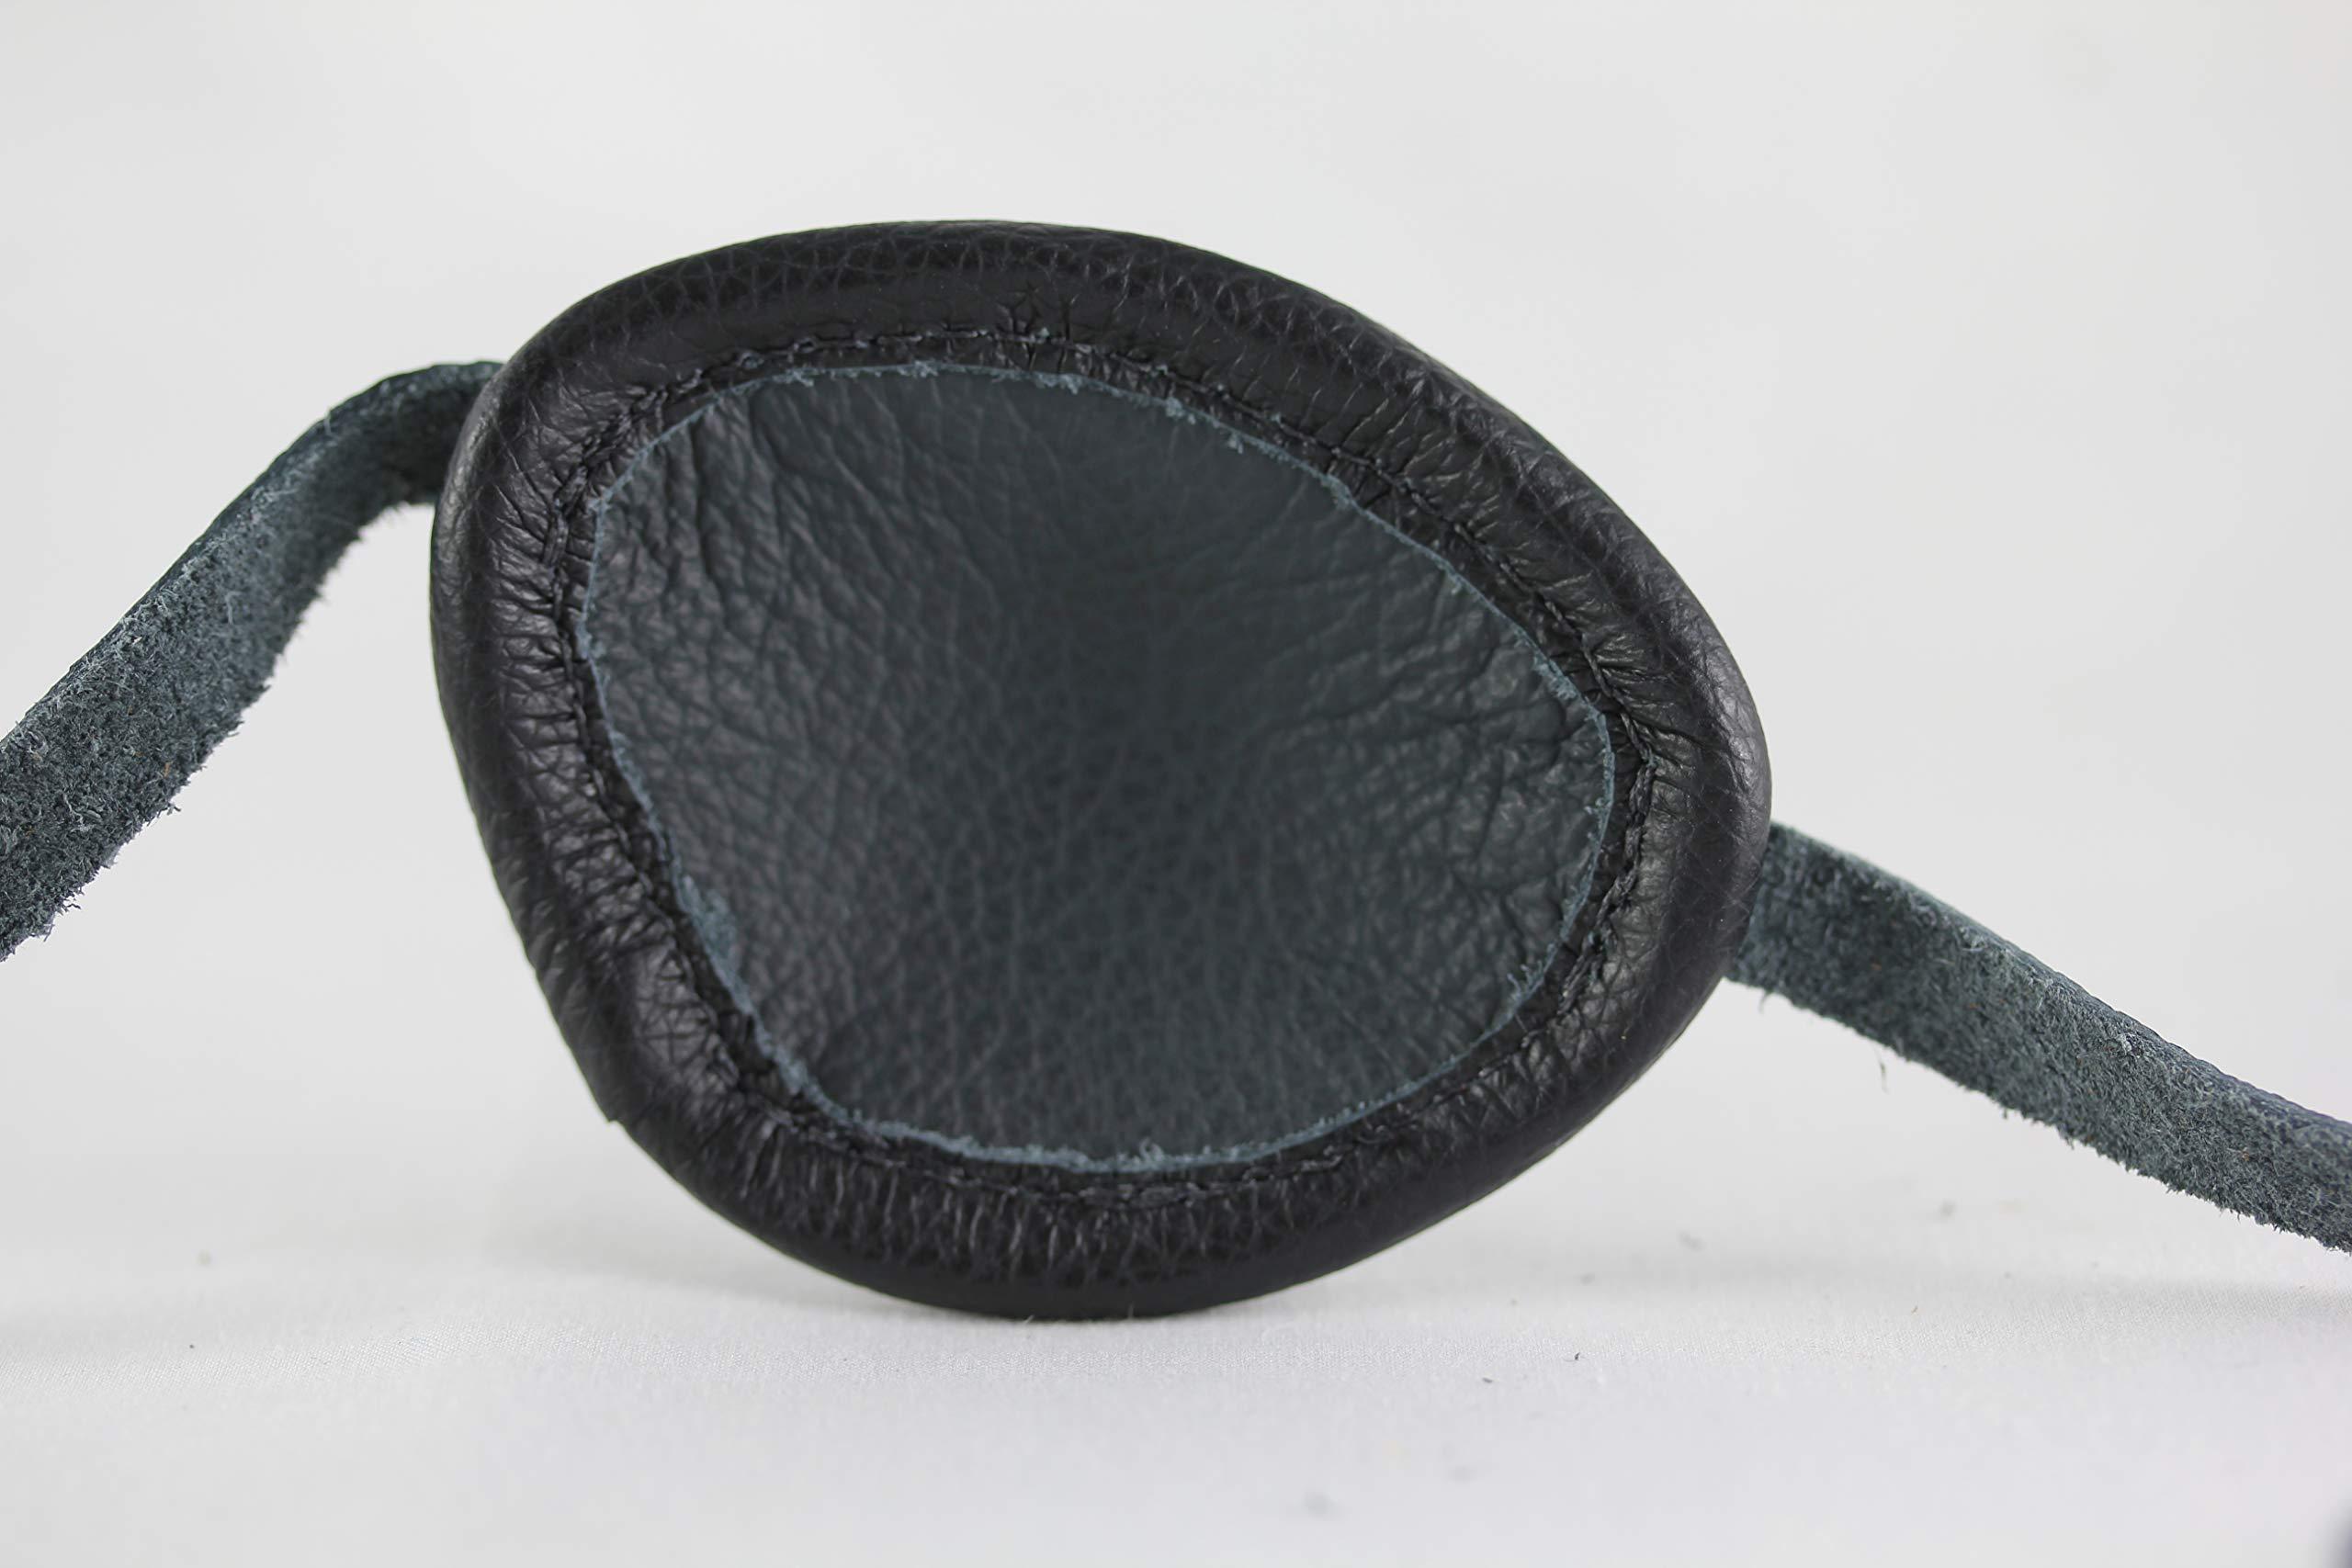 Leather Eyepatch. Slight Convex Eye Patch (Right Eye, Full Size Black) by Desantis Leather Goods (Image #2)